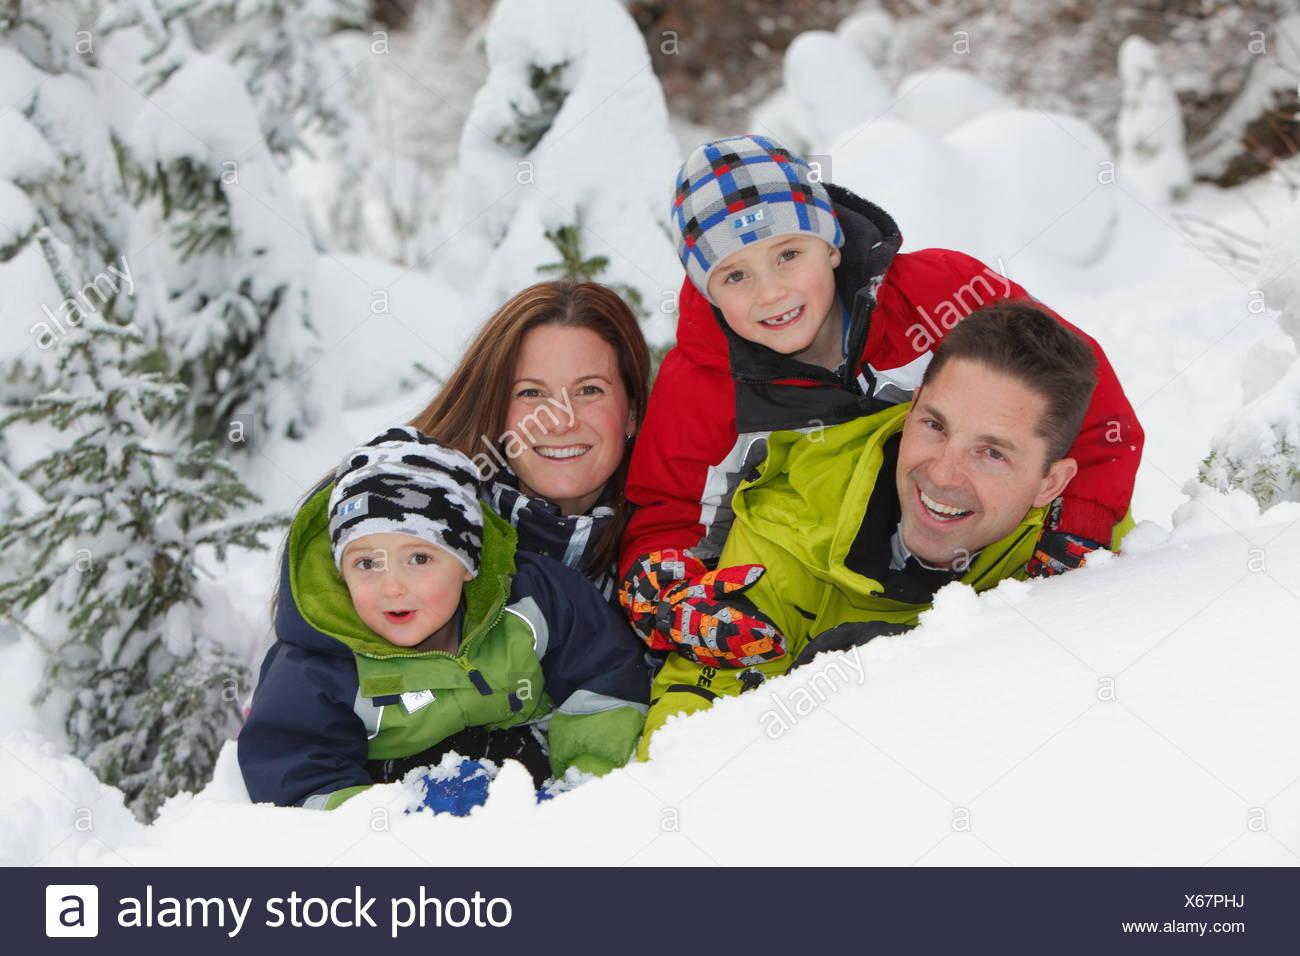 Family in snow at Silver Star Provincial Park, near Vernon, Okanagan, British Columbia, Canada - Stock Image